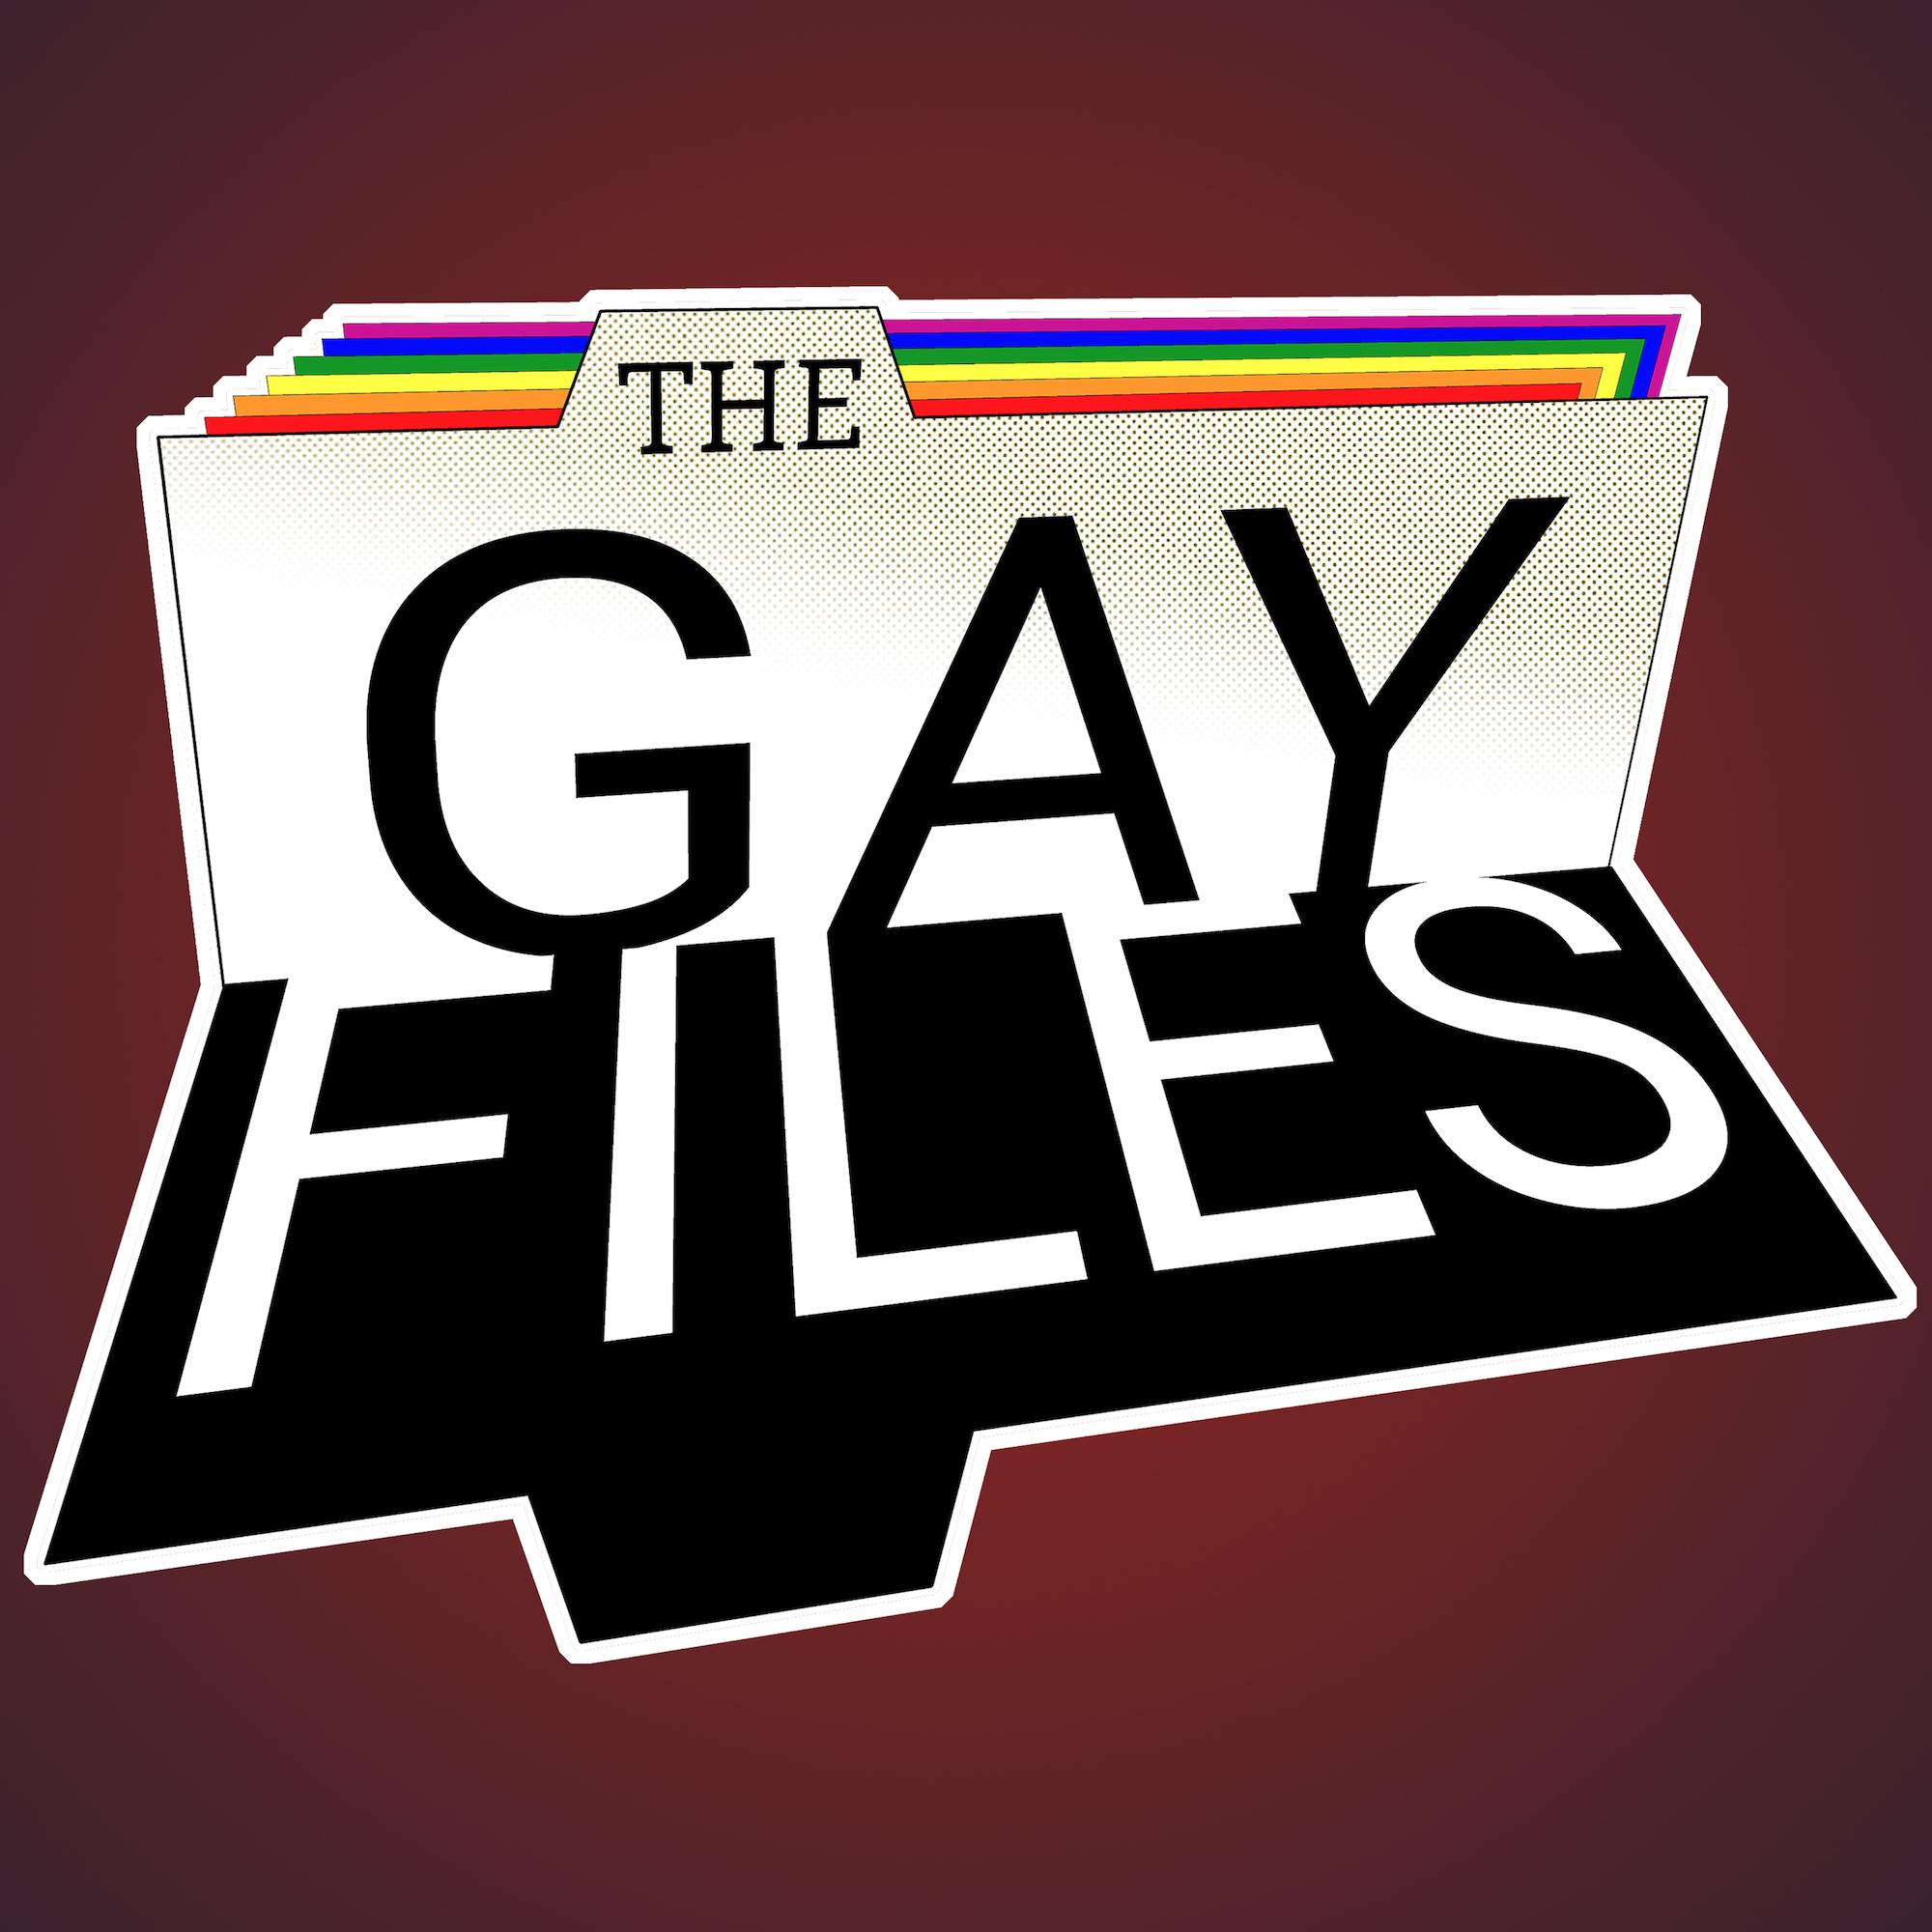 Gay sex kategorier